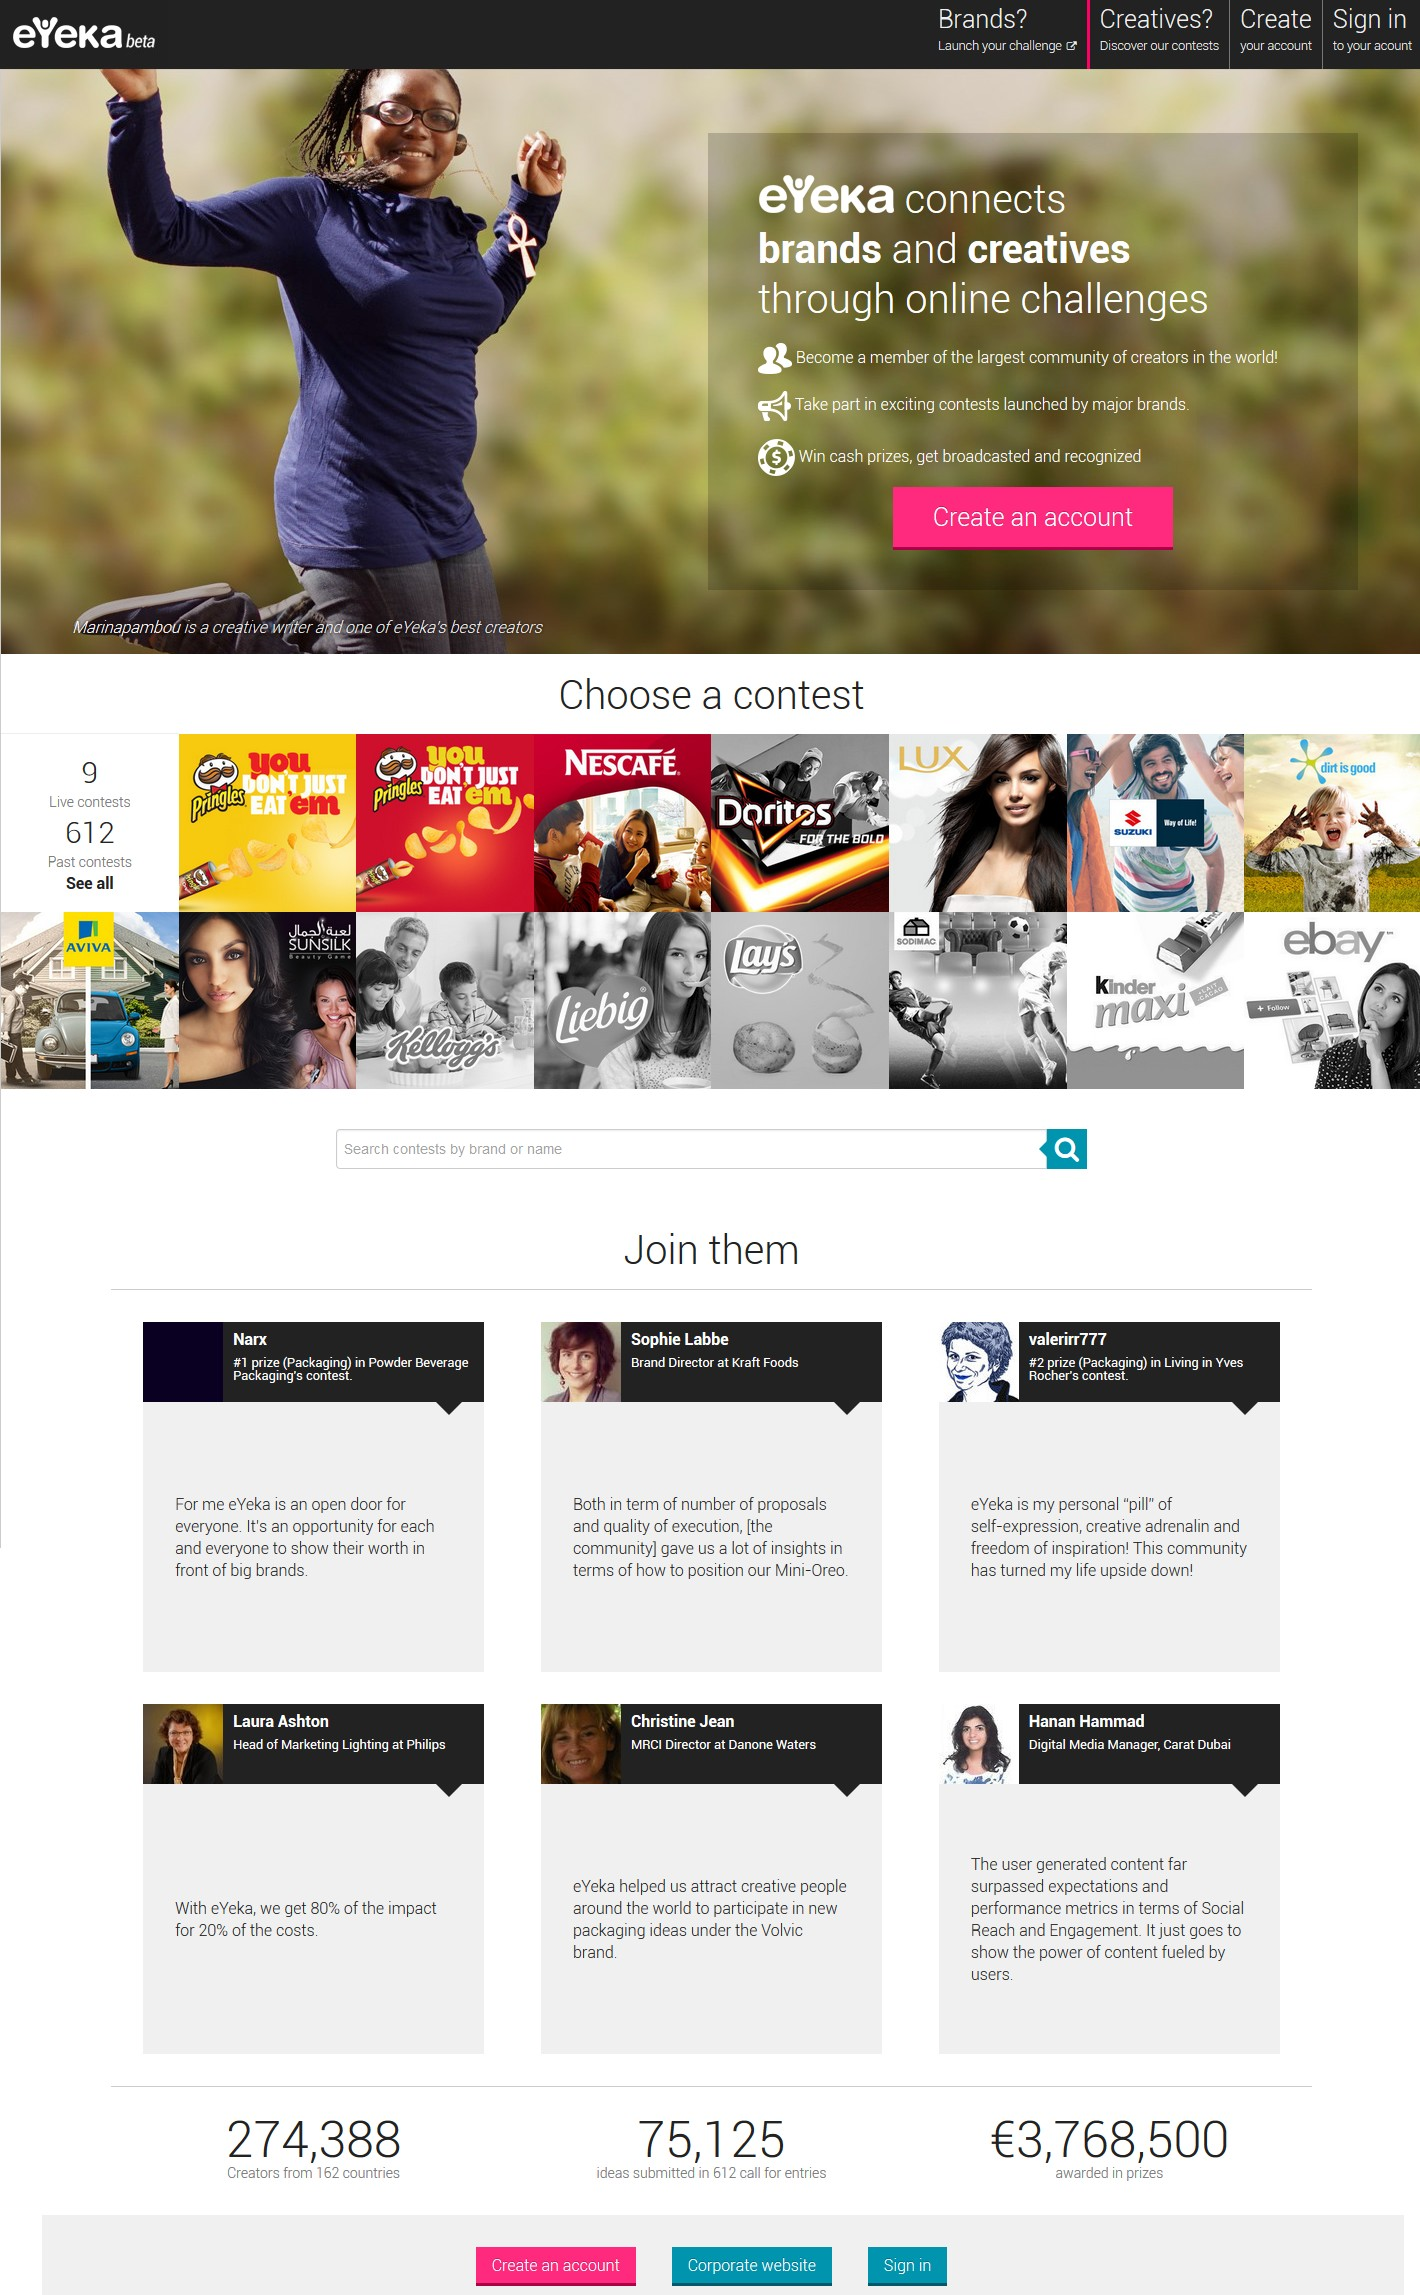 March 2014 - screenshot eyeka.pr.co press releases New eYeka Platform